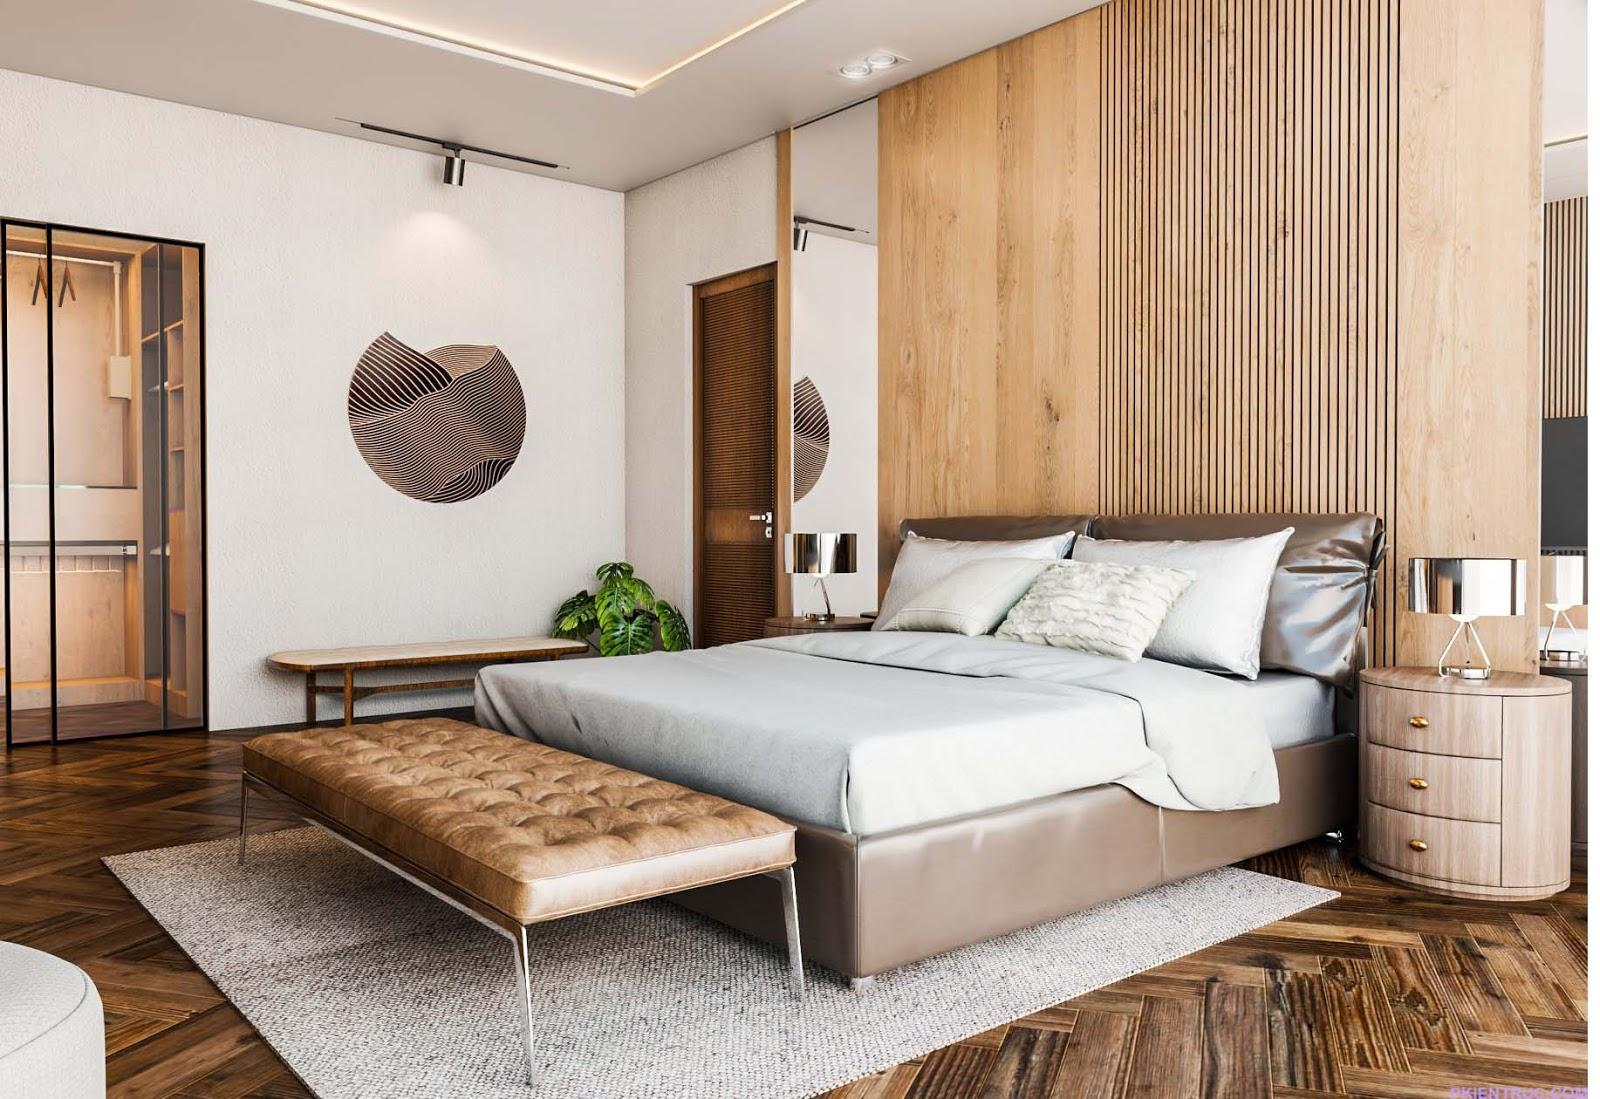 Phối cảnh phòng ngủ cực kỳ sang chảnh